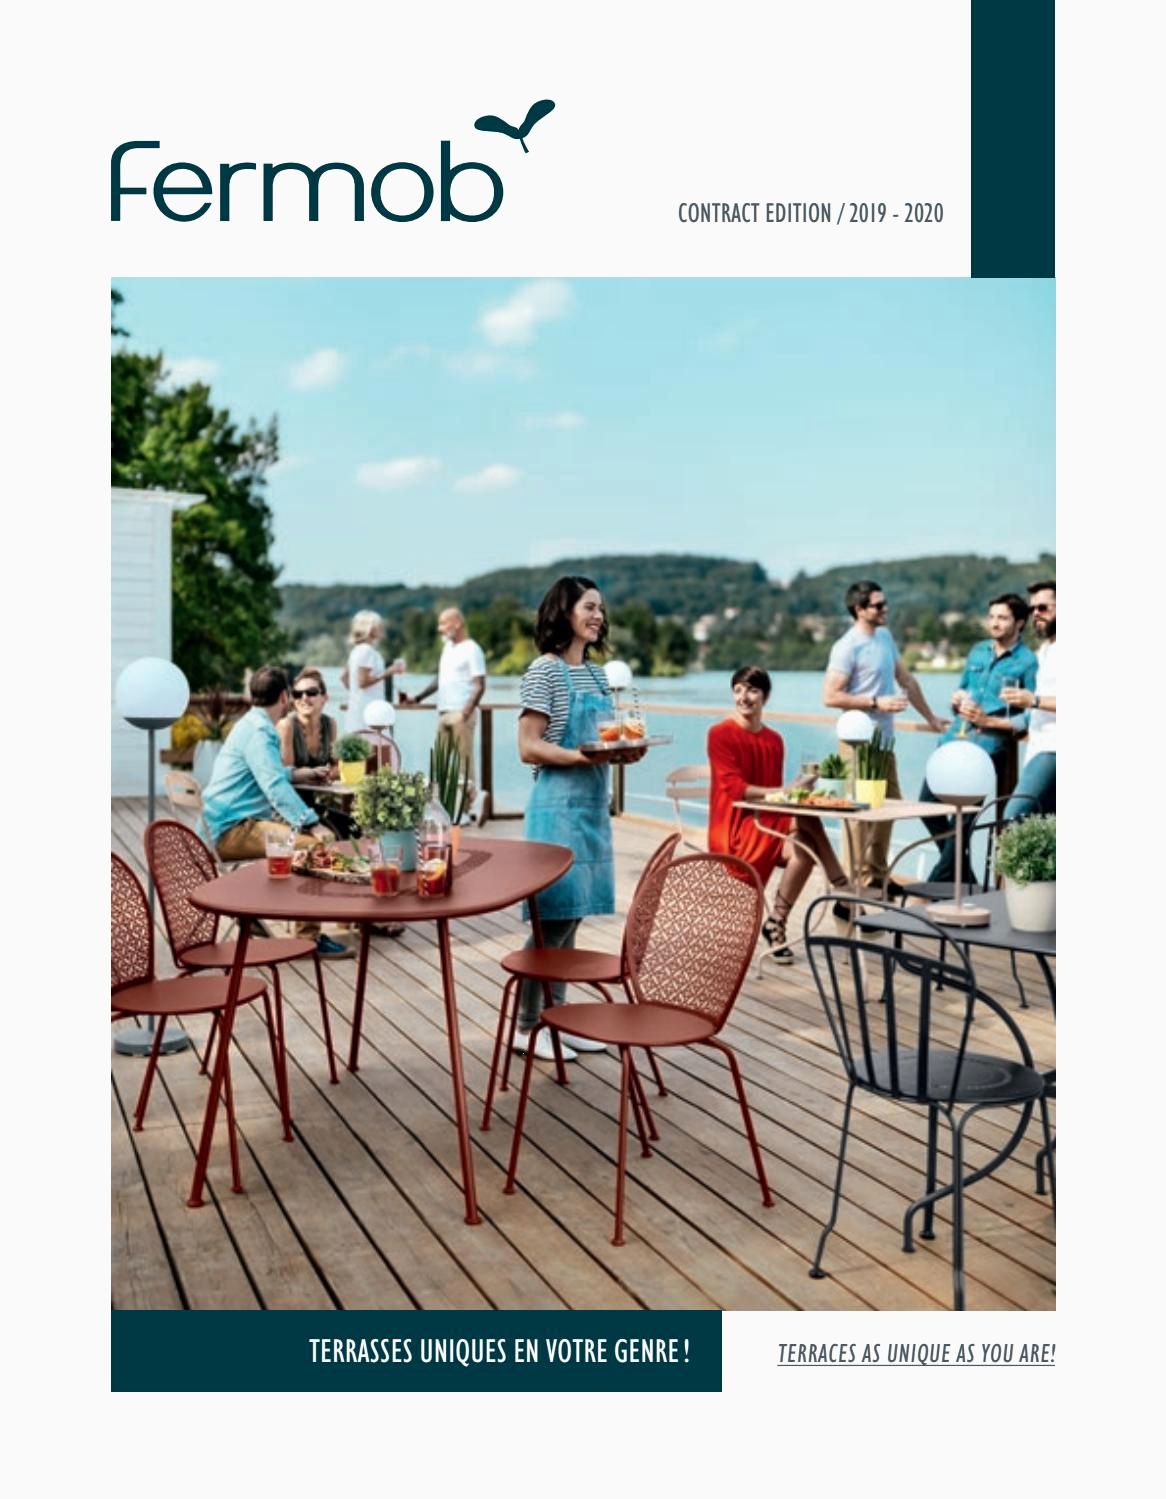 Incroyables Table Jardin Teck Ronde – Homewareshop concernant Table Ronde Teck Leclerc